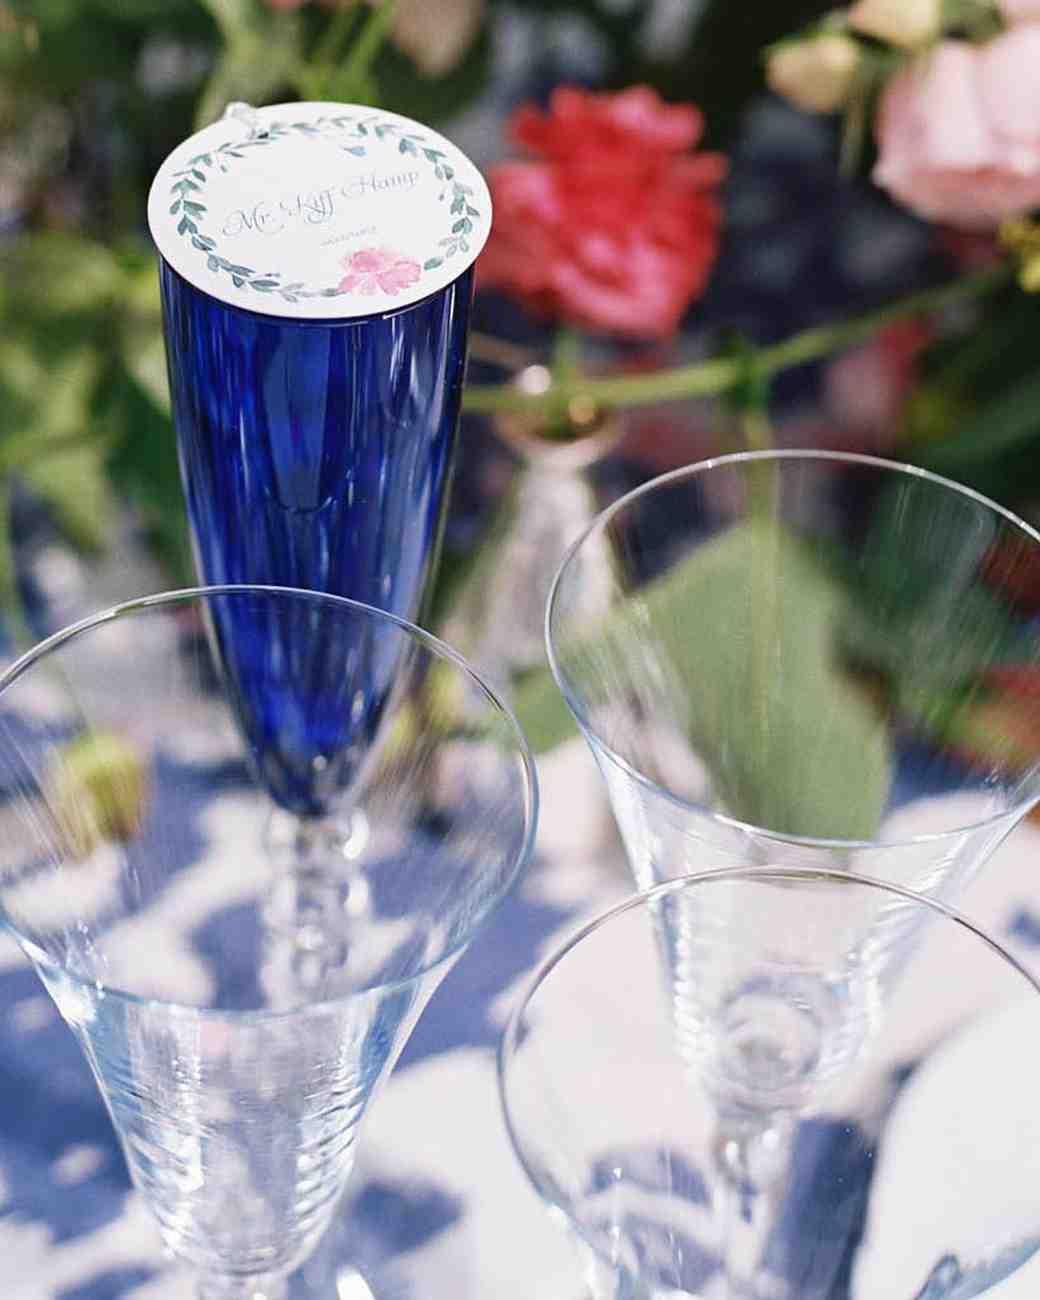 nikki-kiff-wedding-placecard-00475101-s112766-0316.jpg